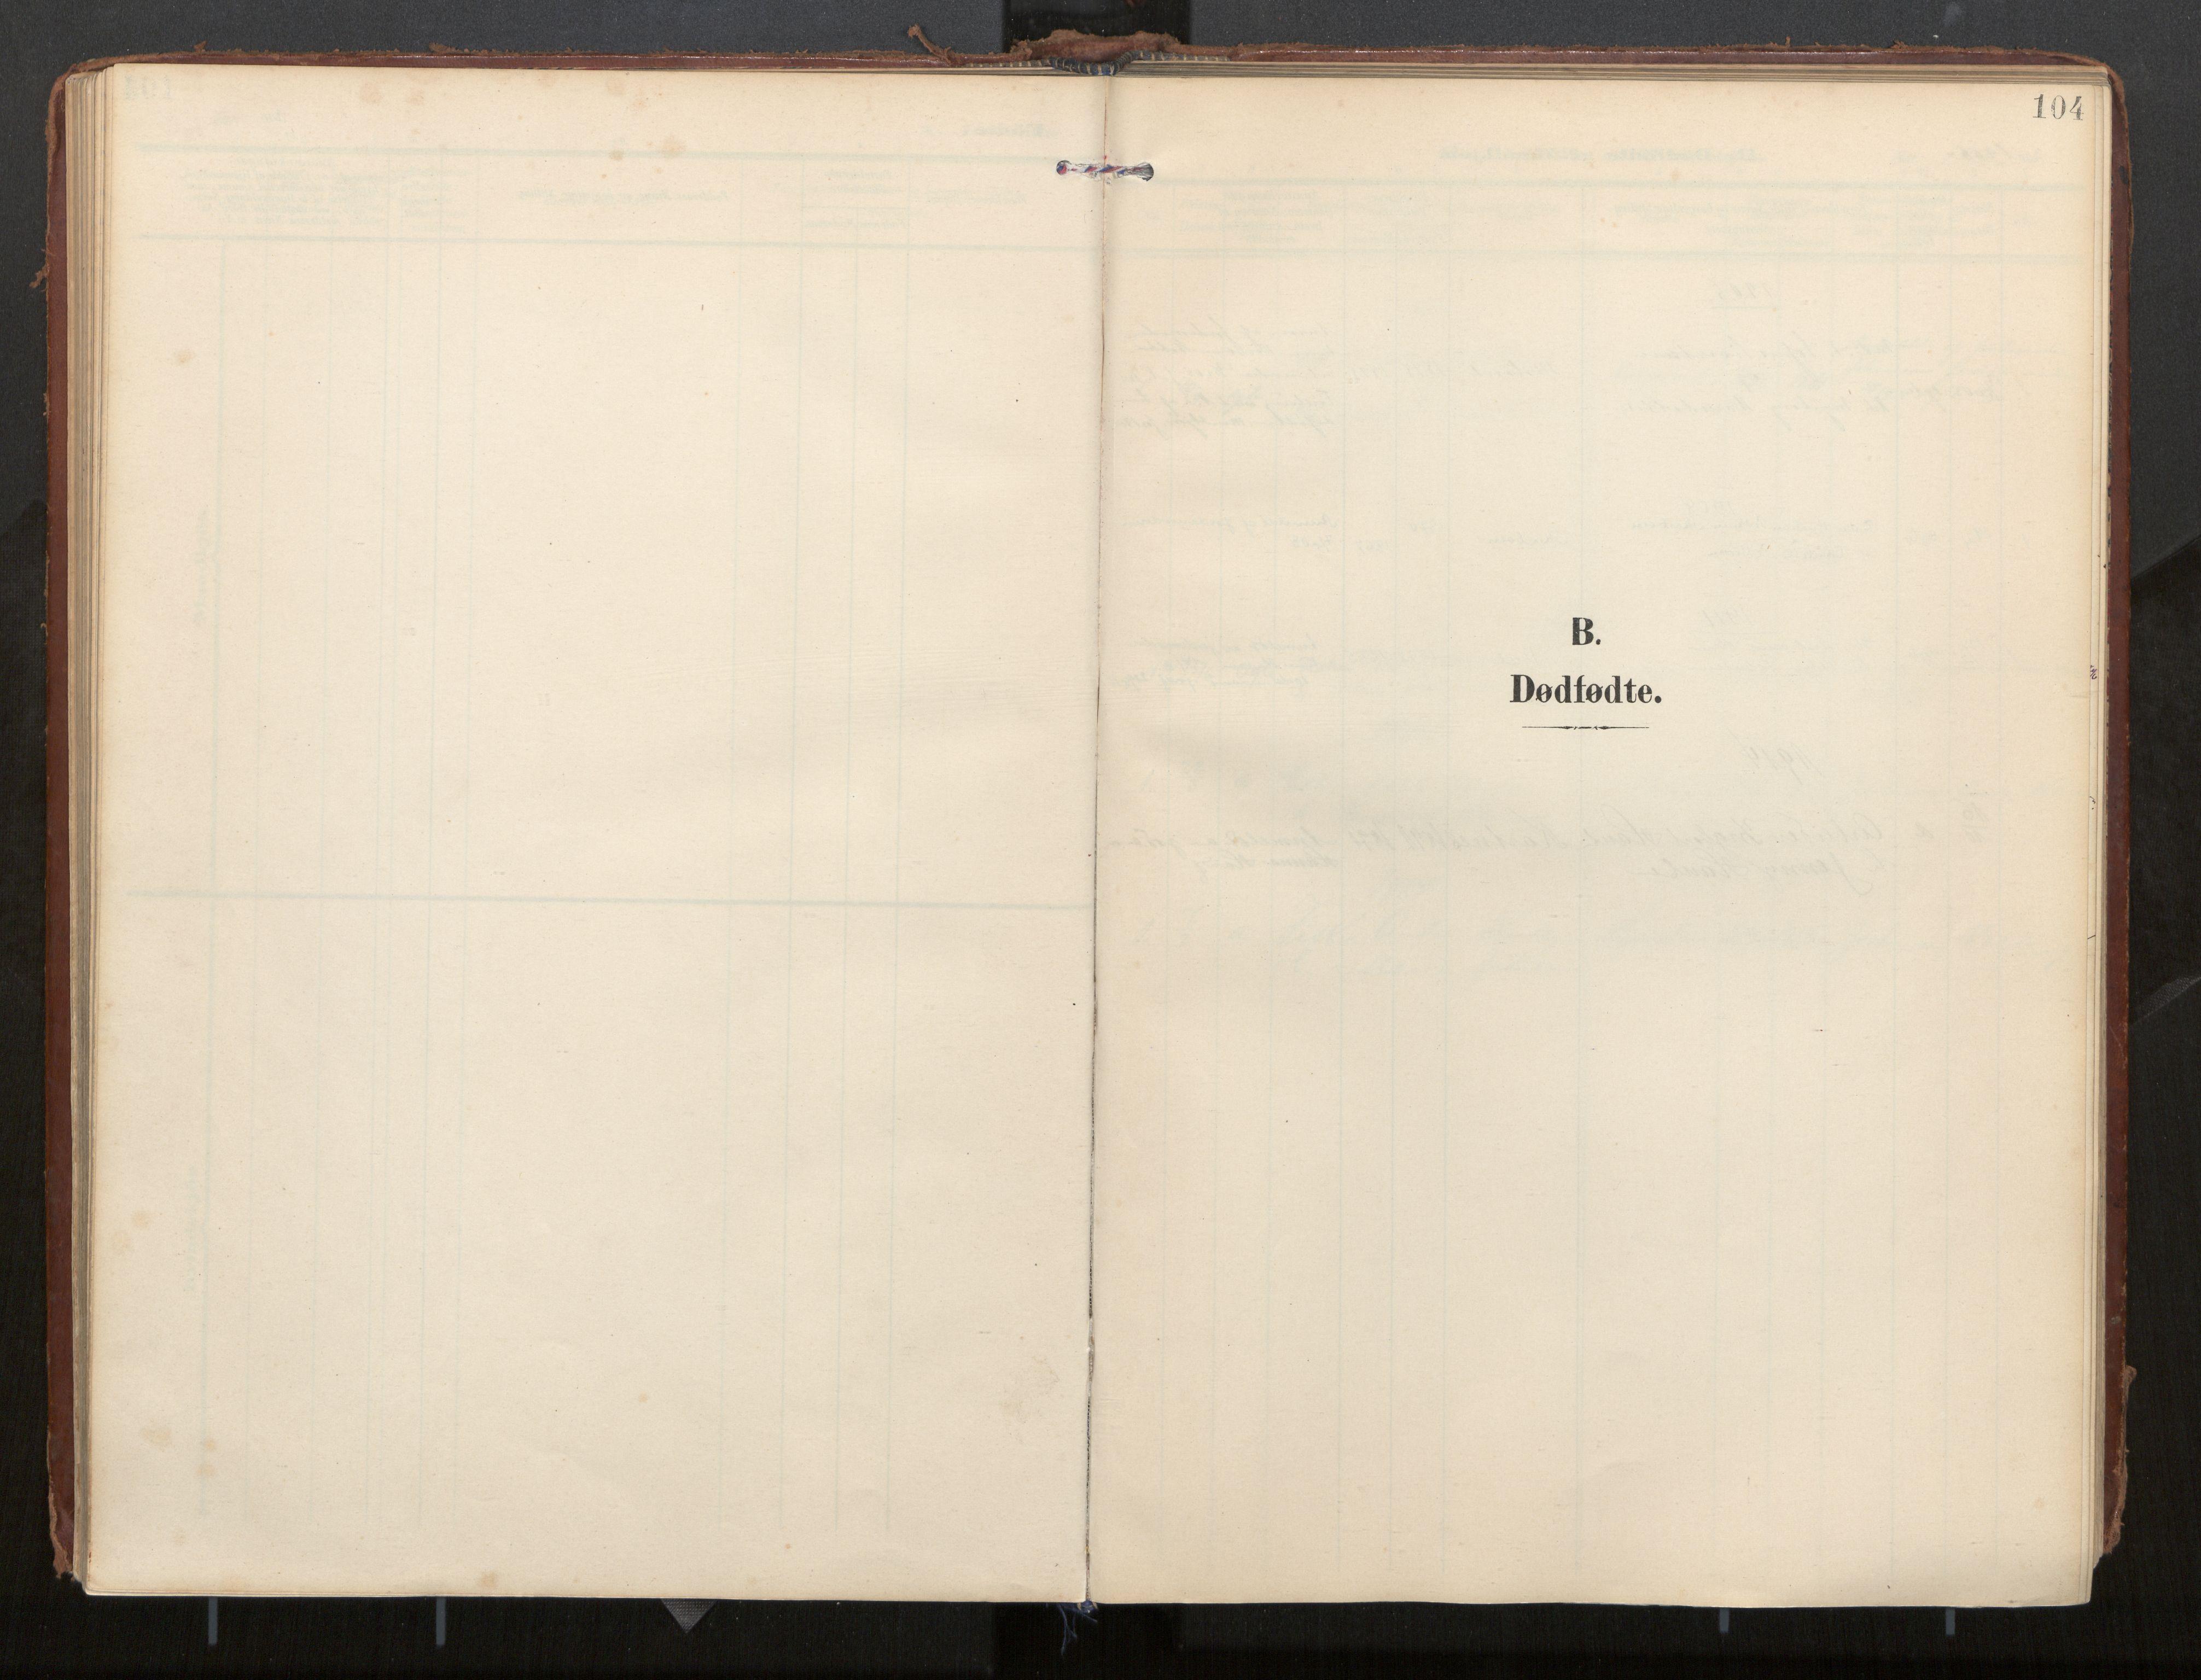 SAT, Ministerialprotokoller, klokkerbøker og fødselsregistre - Nordland, 884/L1194: Ministerialbok nr. 884A02, 1906-1937, s. 104